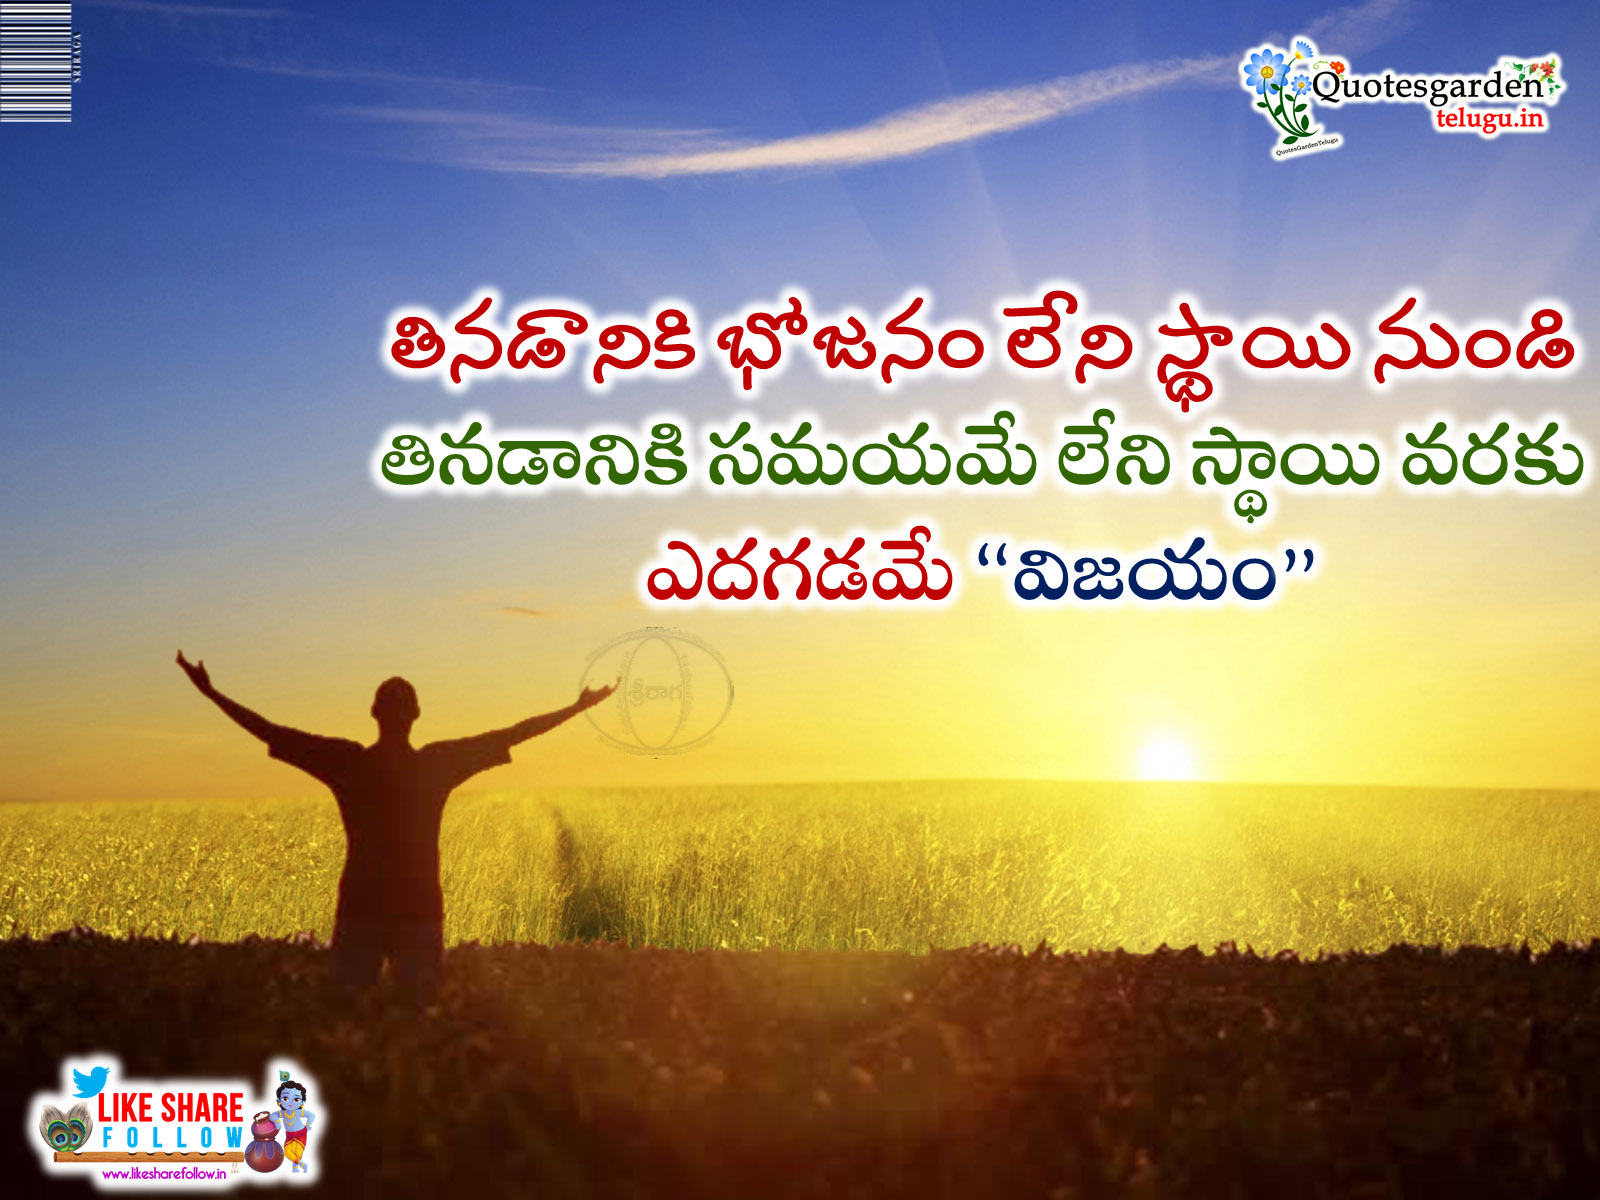 Telugu Inspirational Quotes Images Download - Wisdom Line w